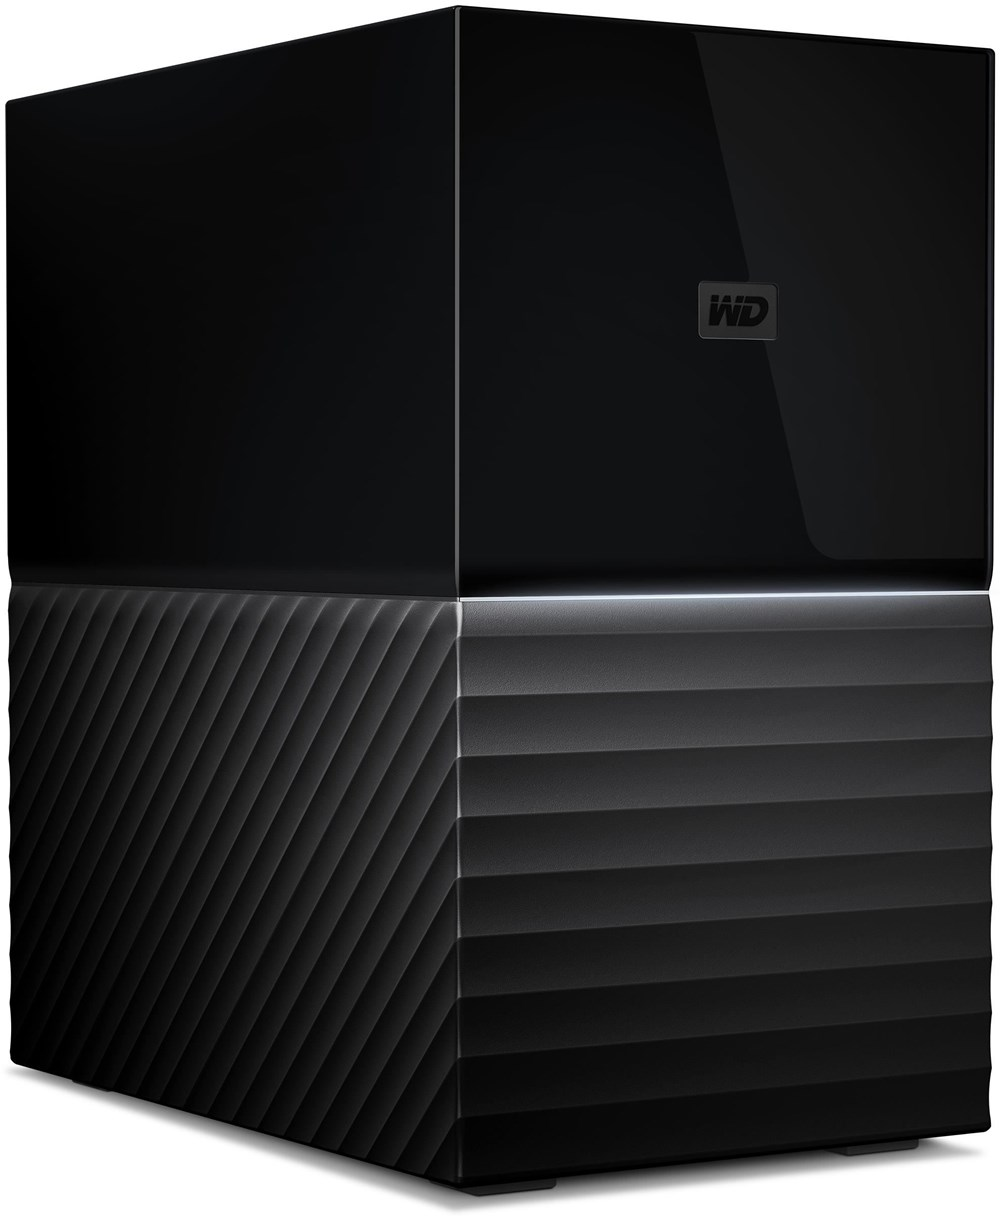 WD My Book Duo RAID Desktopspeicher 8TB WDBFBE0080JBK-EESN